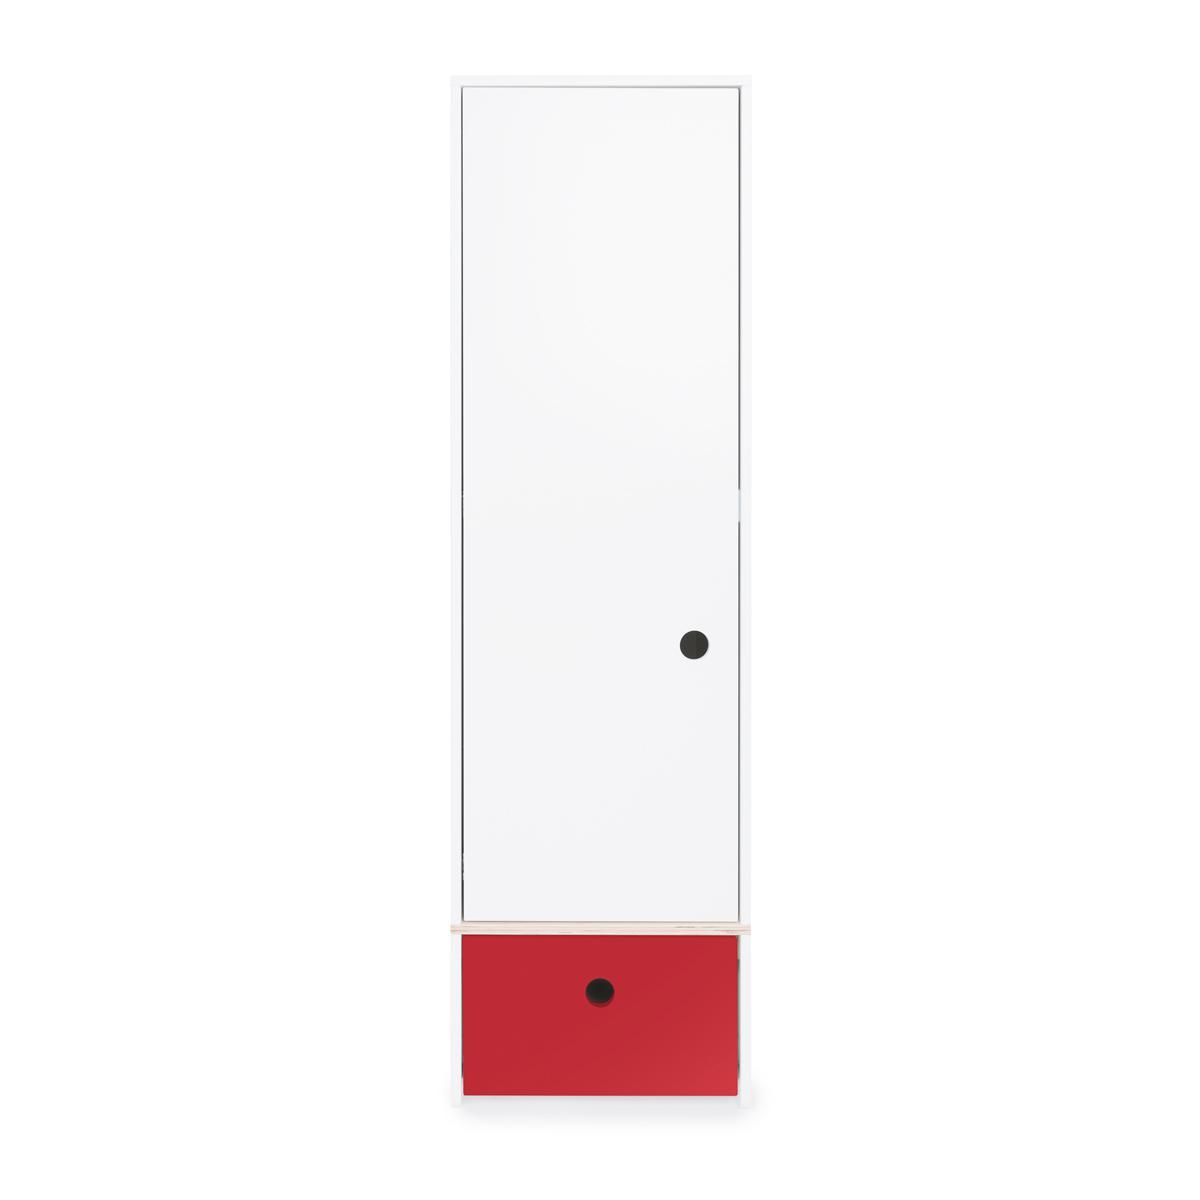 Armoire 1 porte façade tiroir rouge